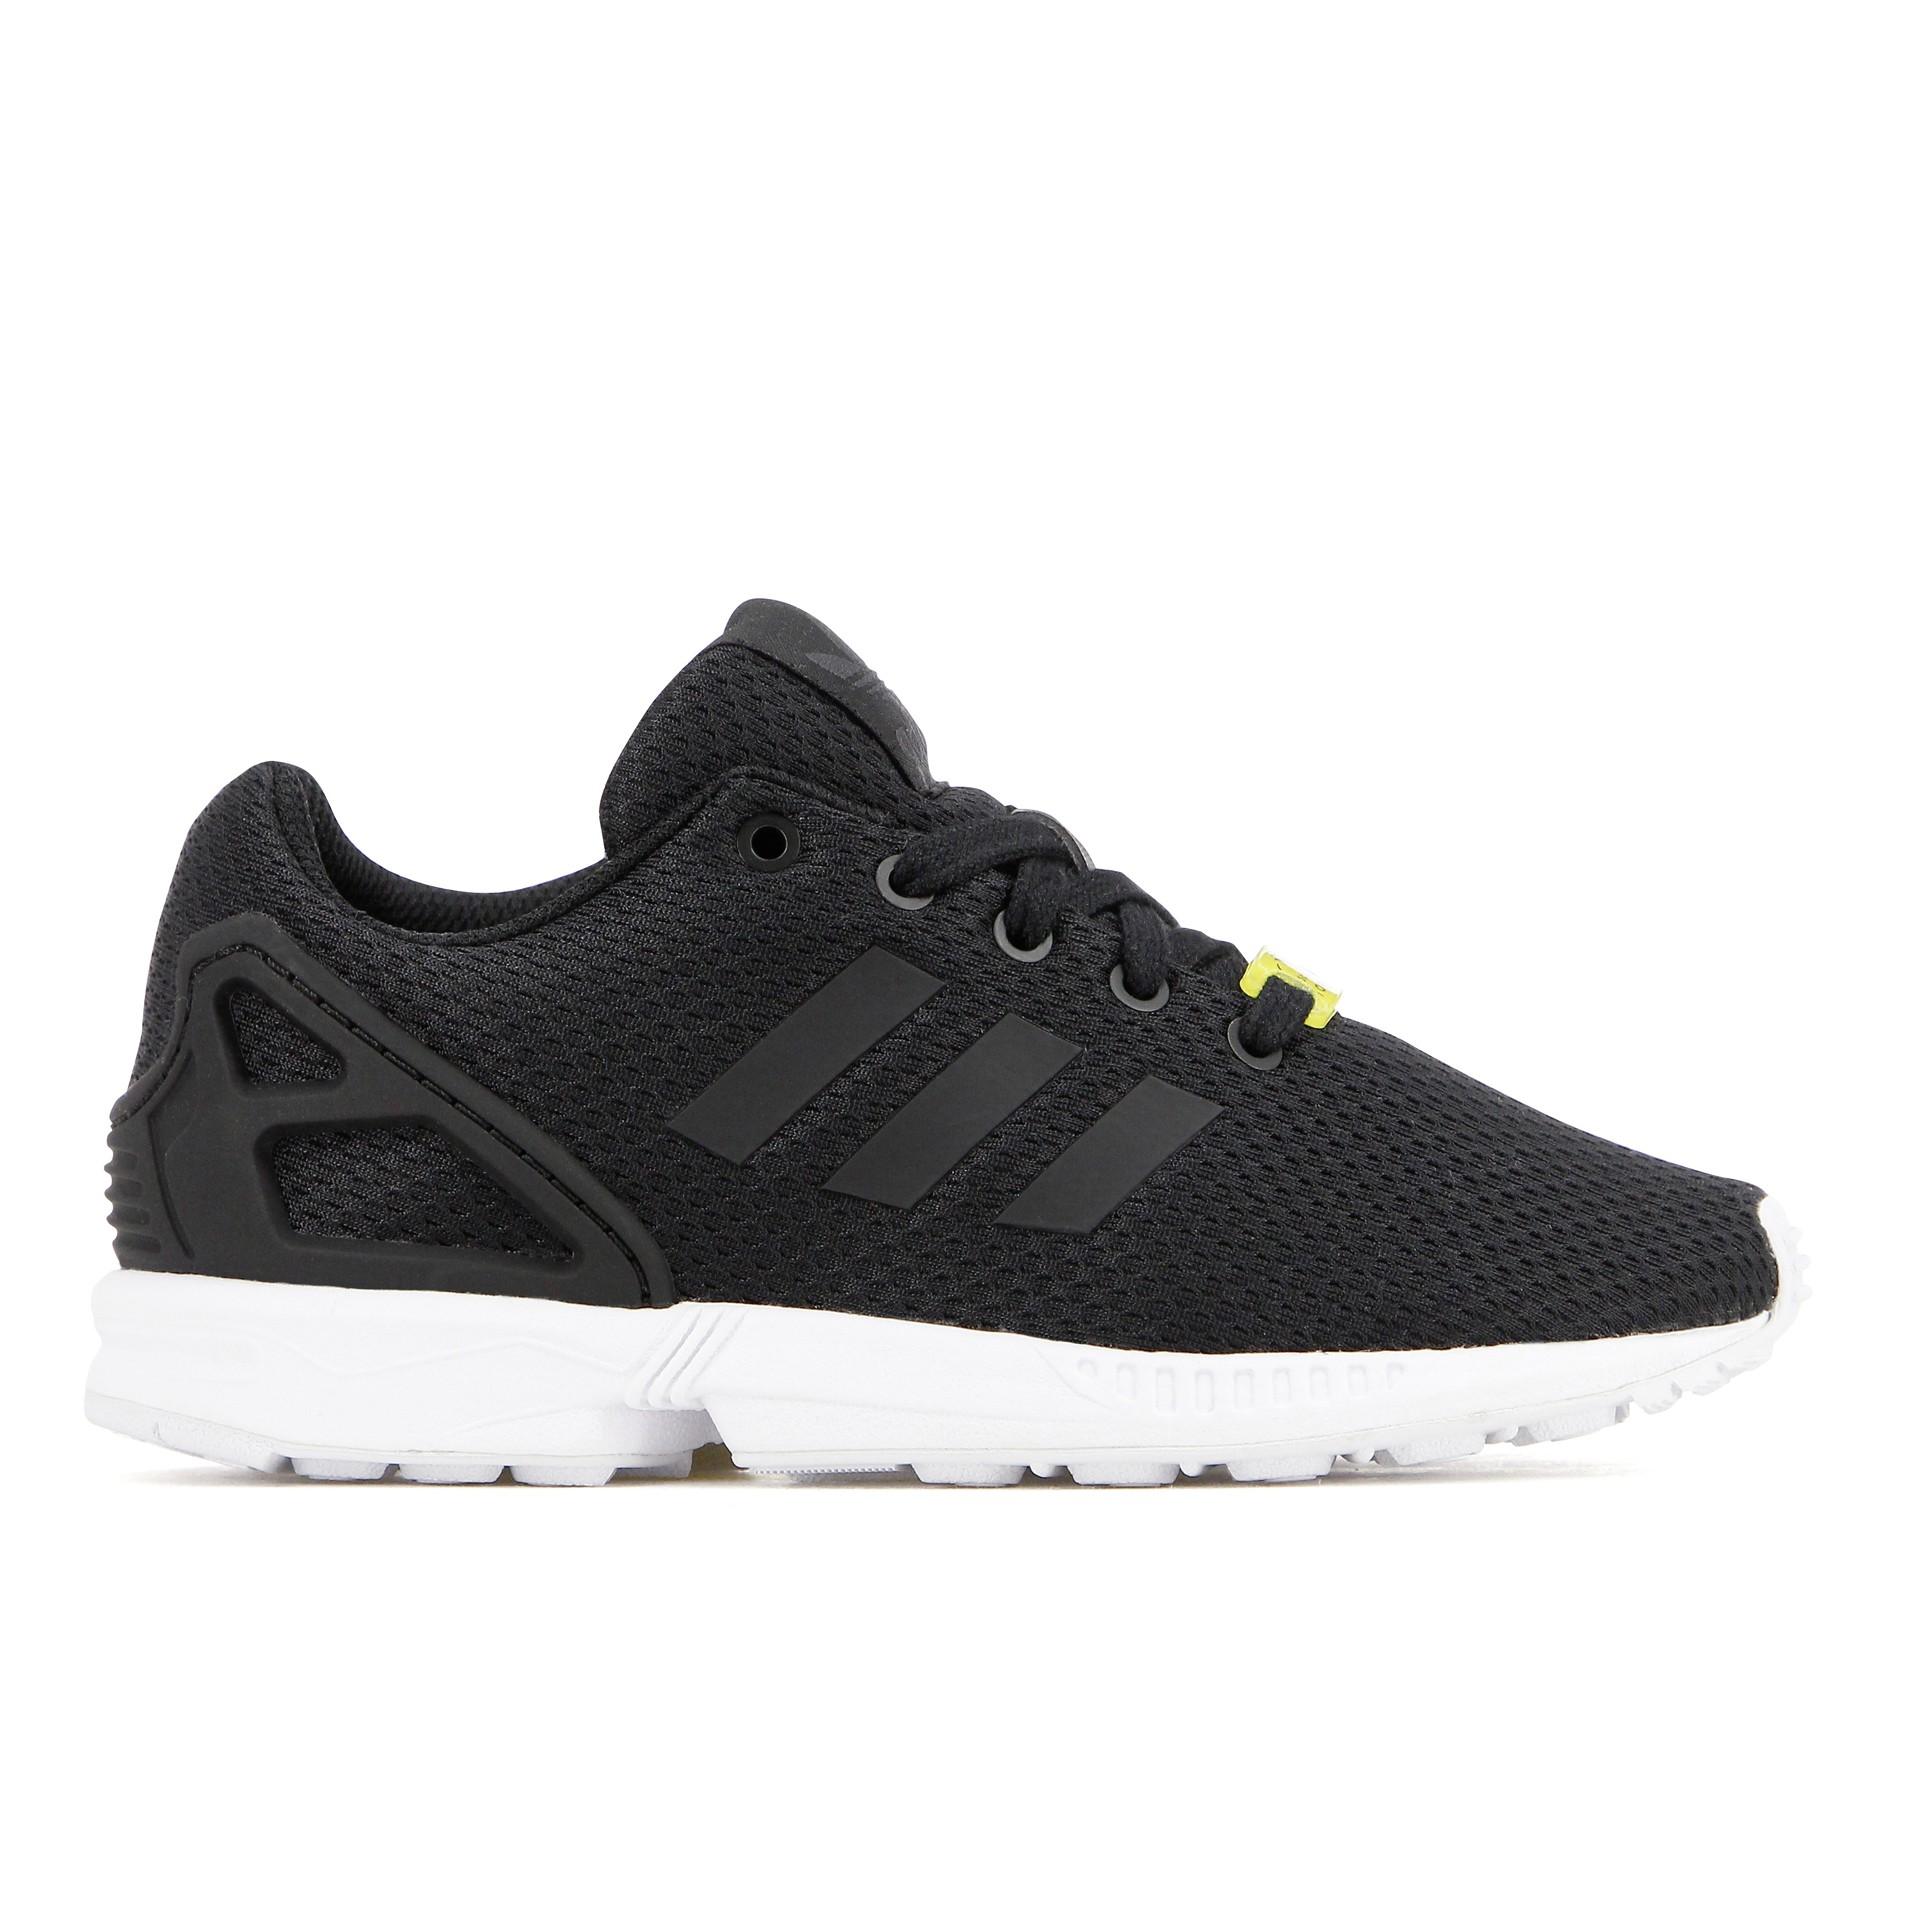 adidas zx femme chaussures